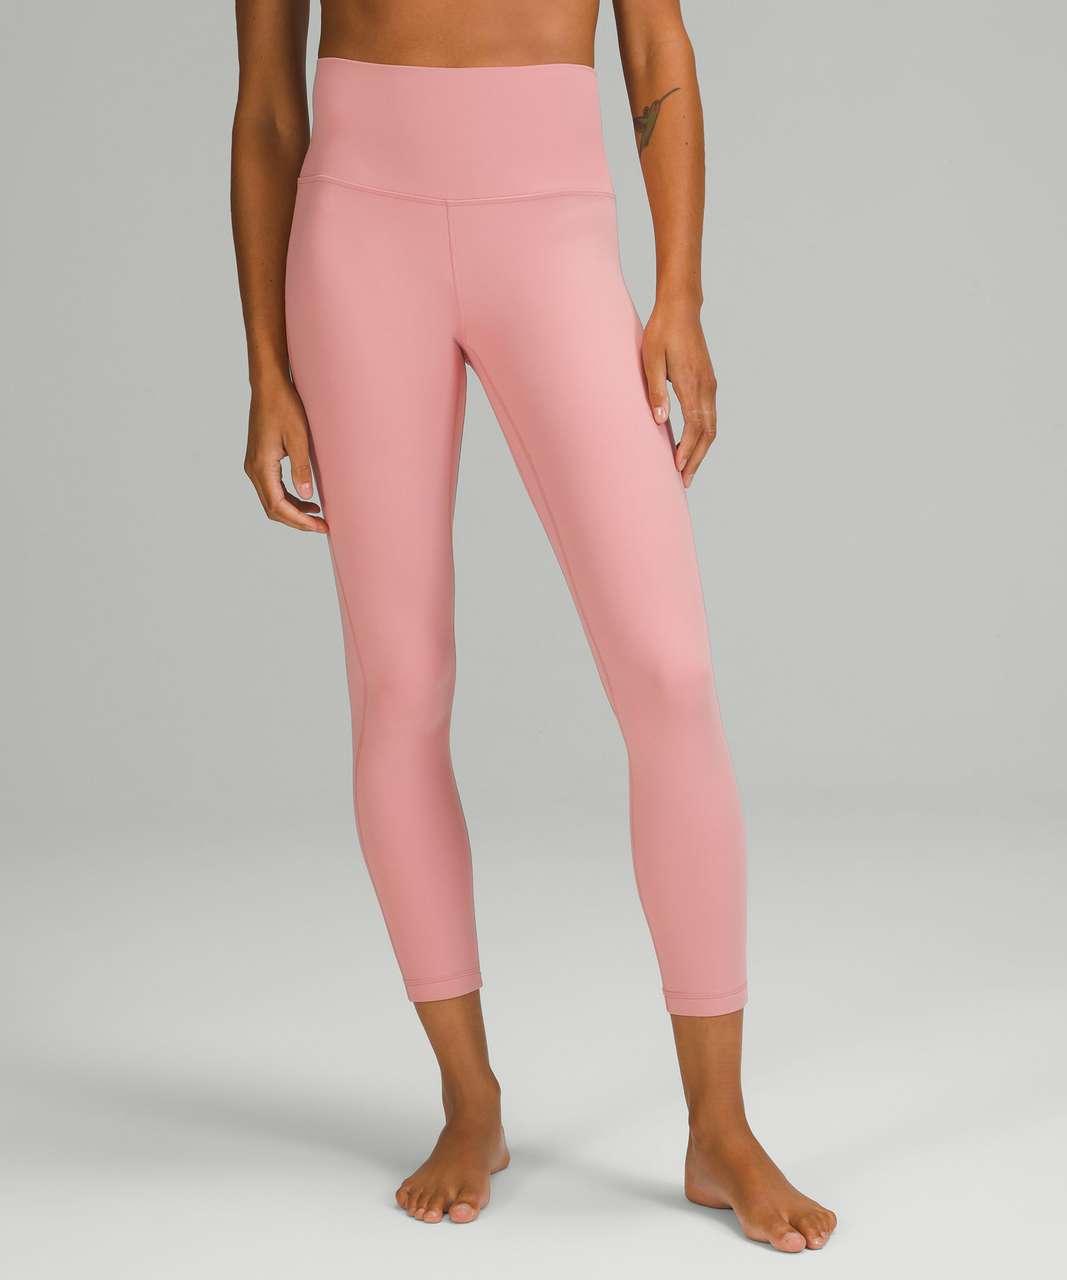 "Lululemon Align High-Rise Pant 25"" - Pink Puff"